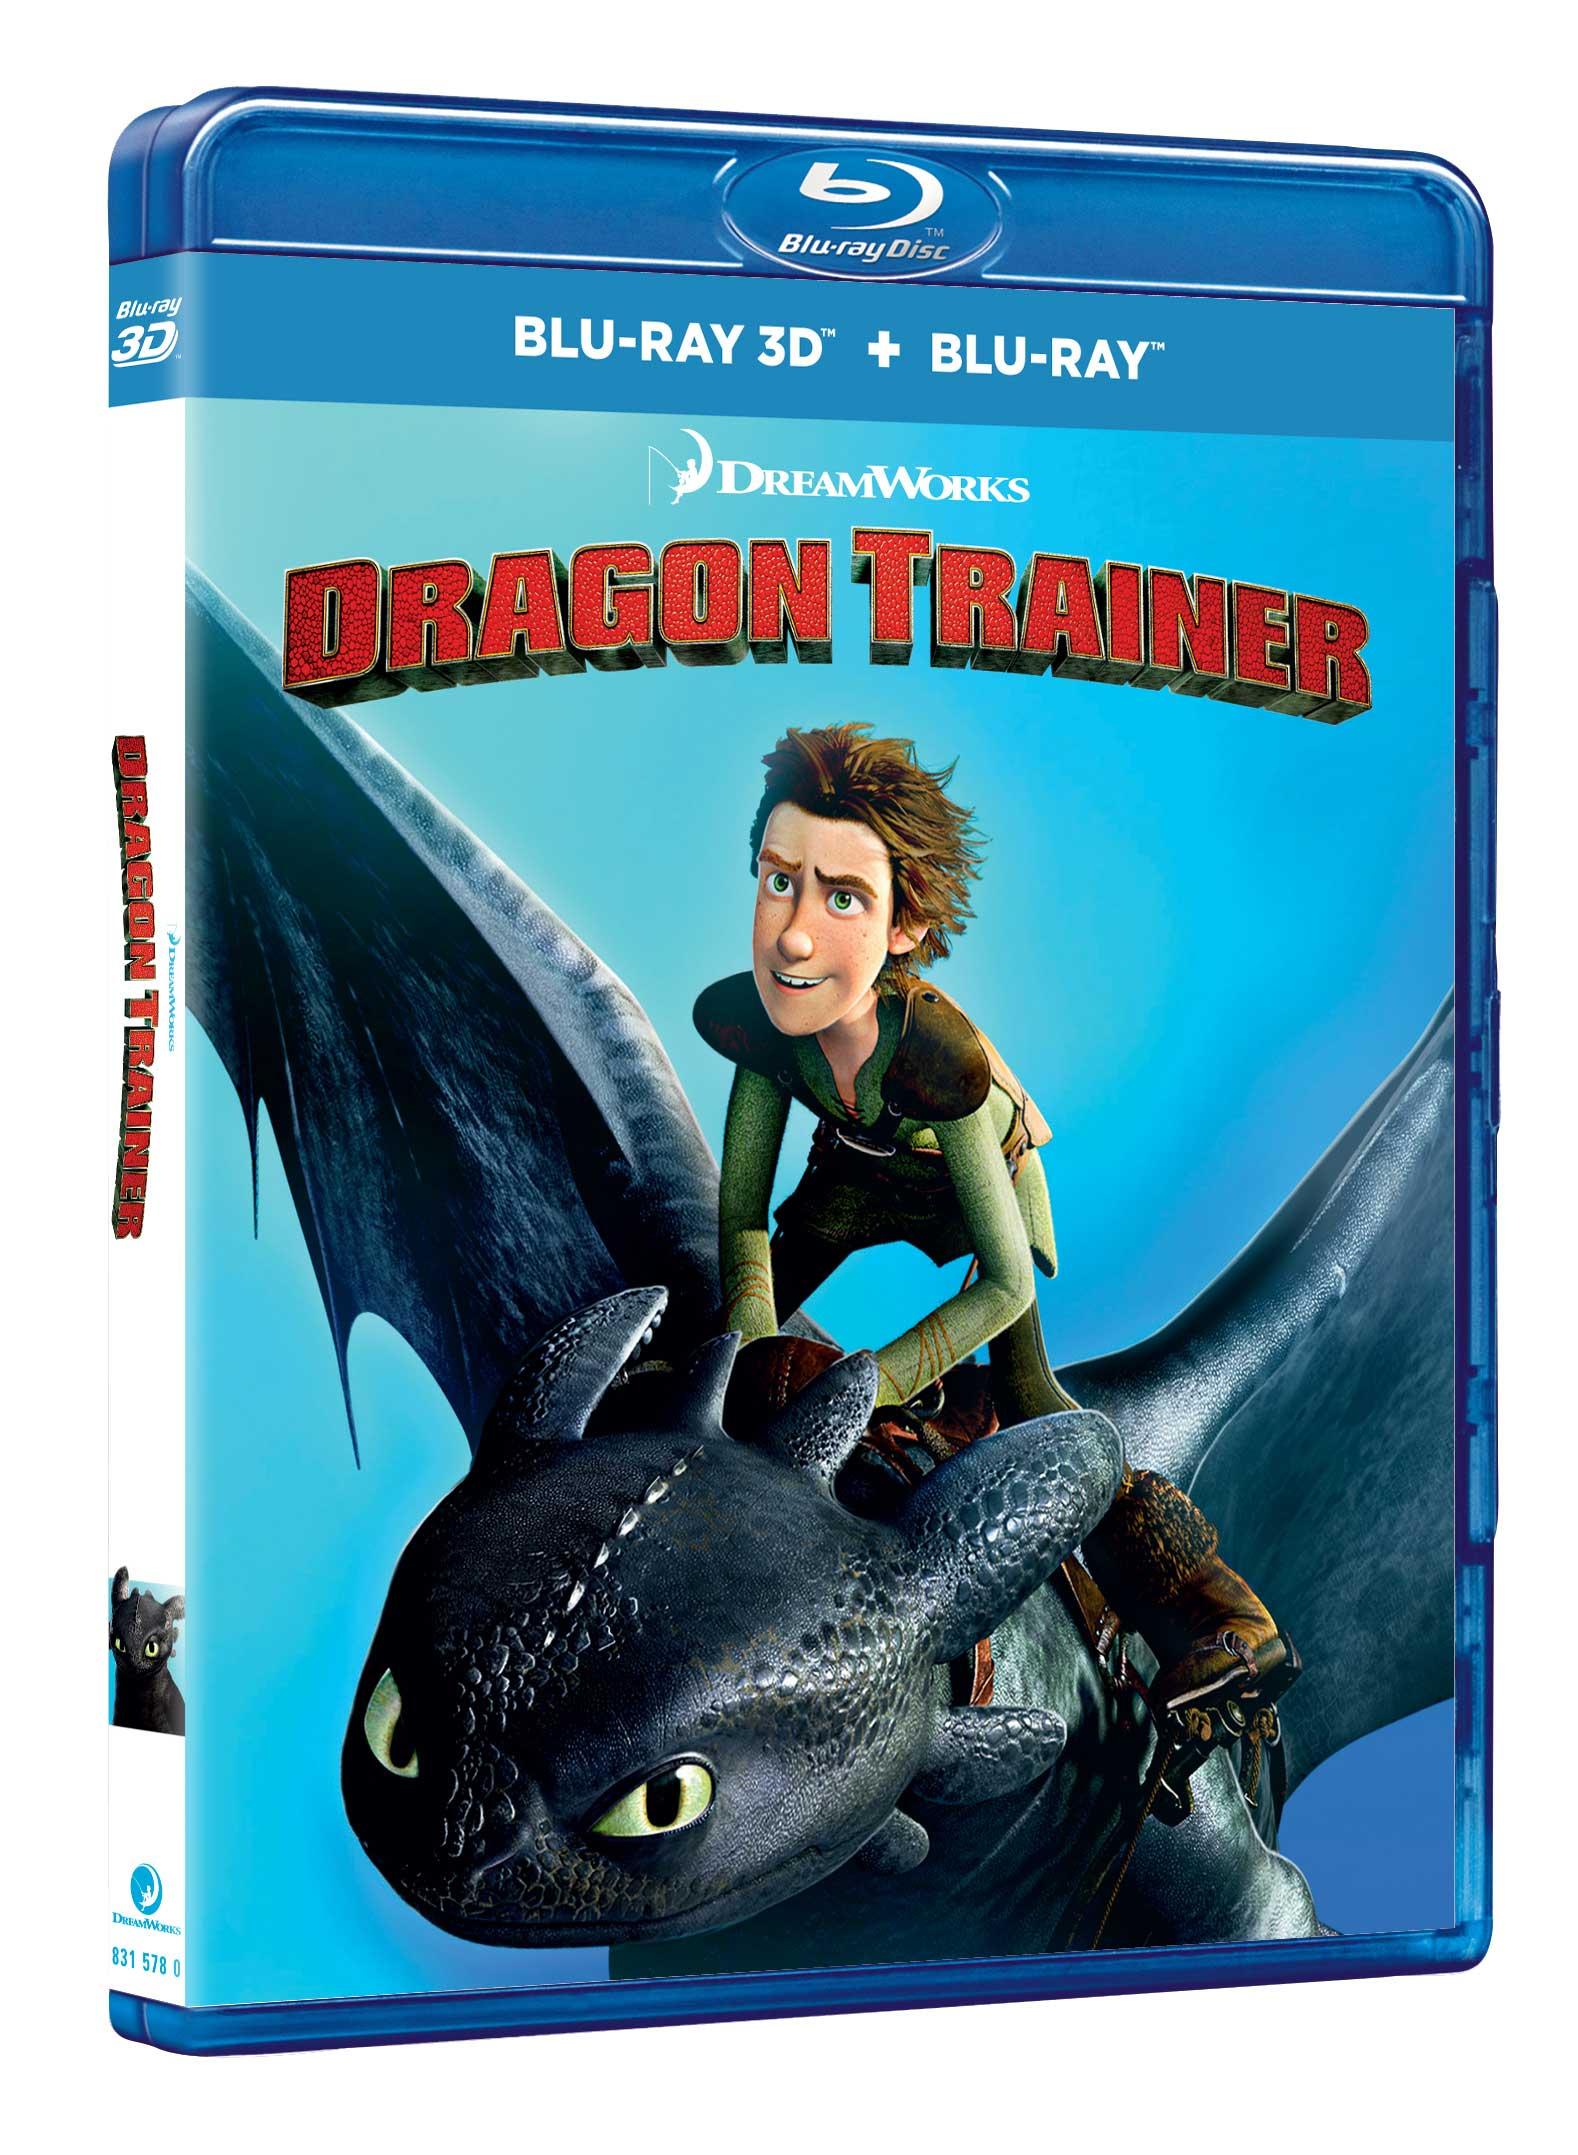 DRAGON TRAINER (BLU-RAY 3D+BLU-RAY)